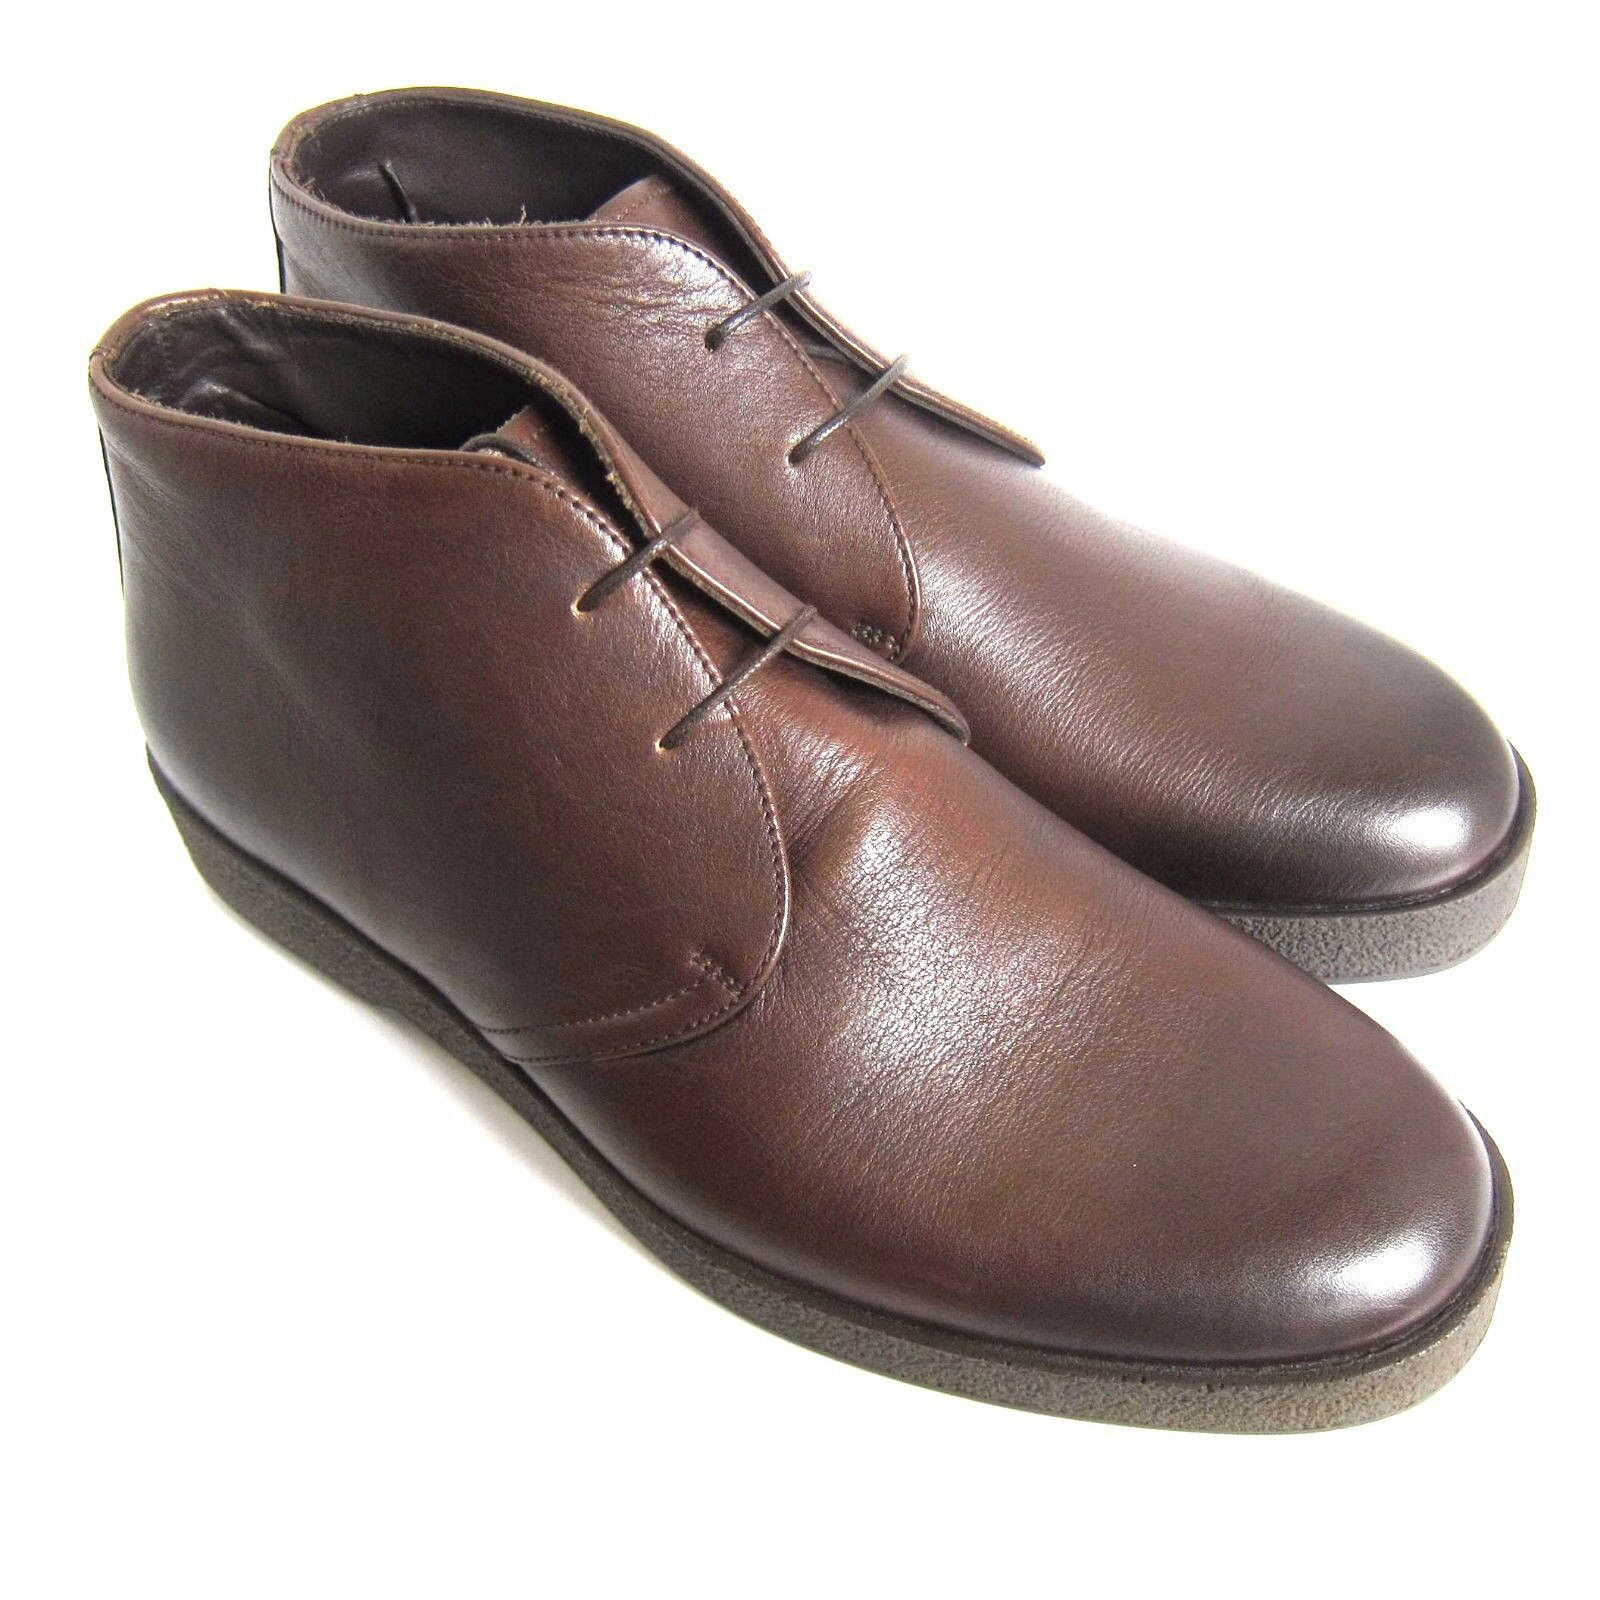 C-1358125 Neu Ermenegildo Zegna Leder Stiefeletten Schuhe Größe US 9D Marked 8EE